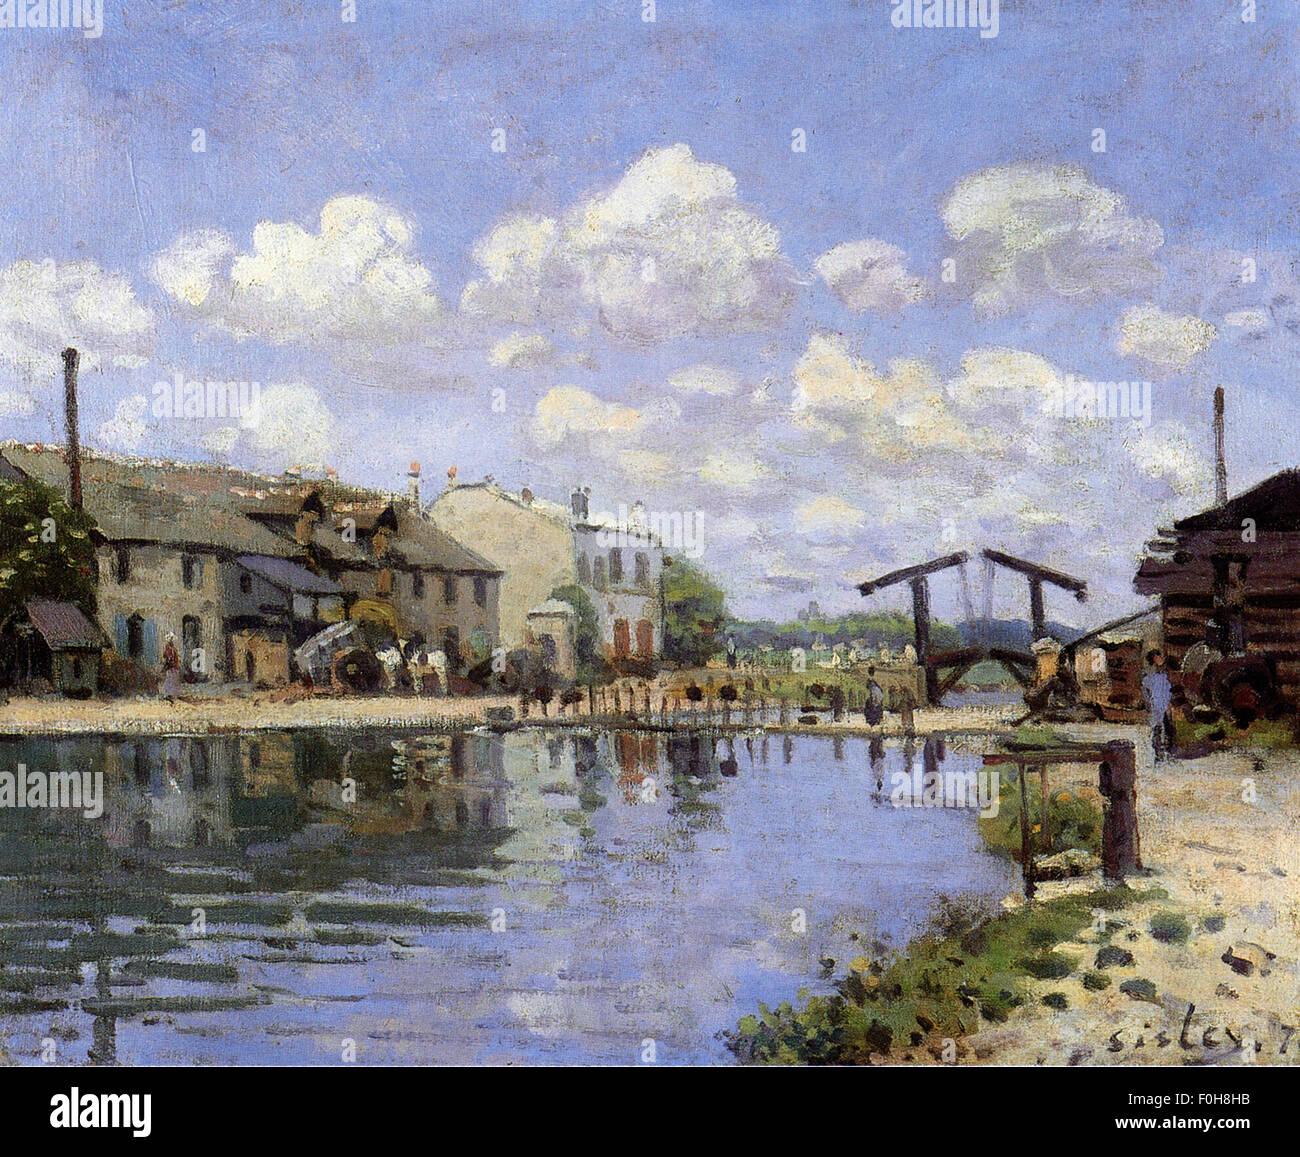 Alfred Sisley - Le Canal Saint Martin - Stock Image